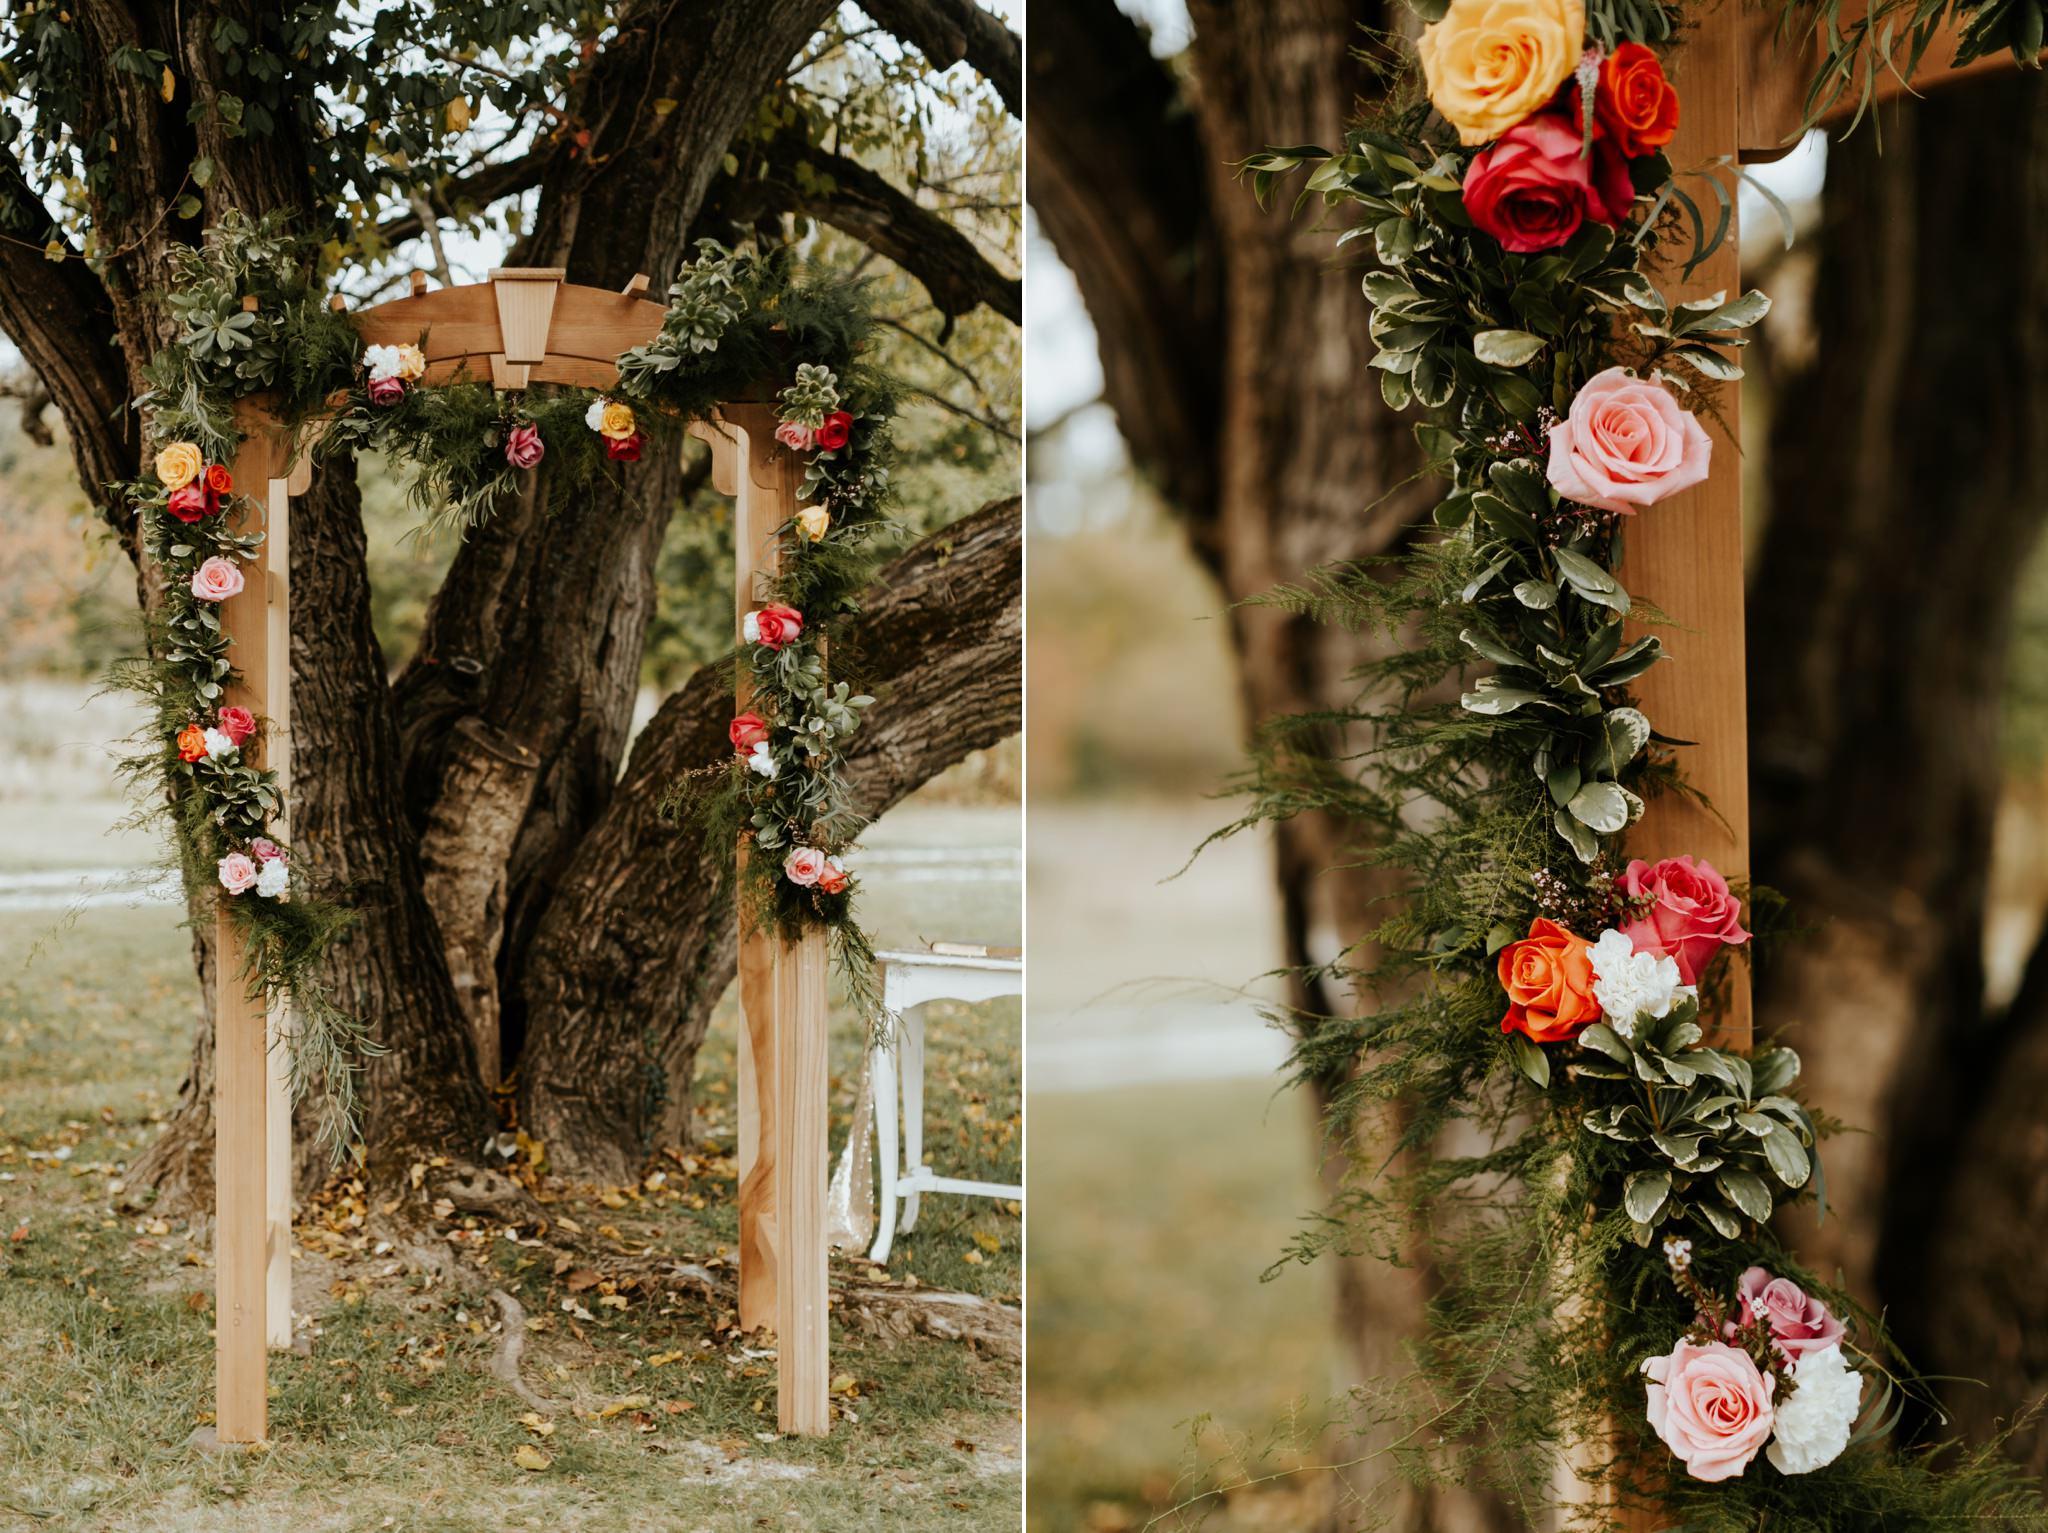 17-09-15 Lindsey and Brandon Wedding Edited-65_WEB.jpg